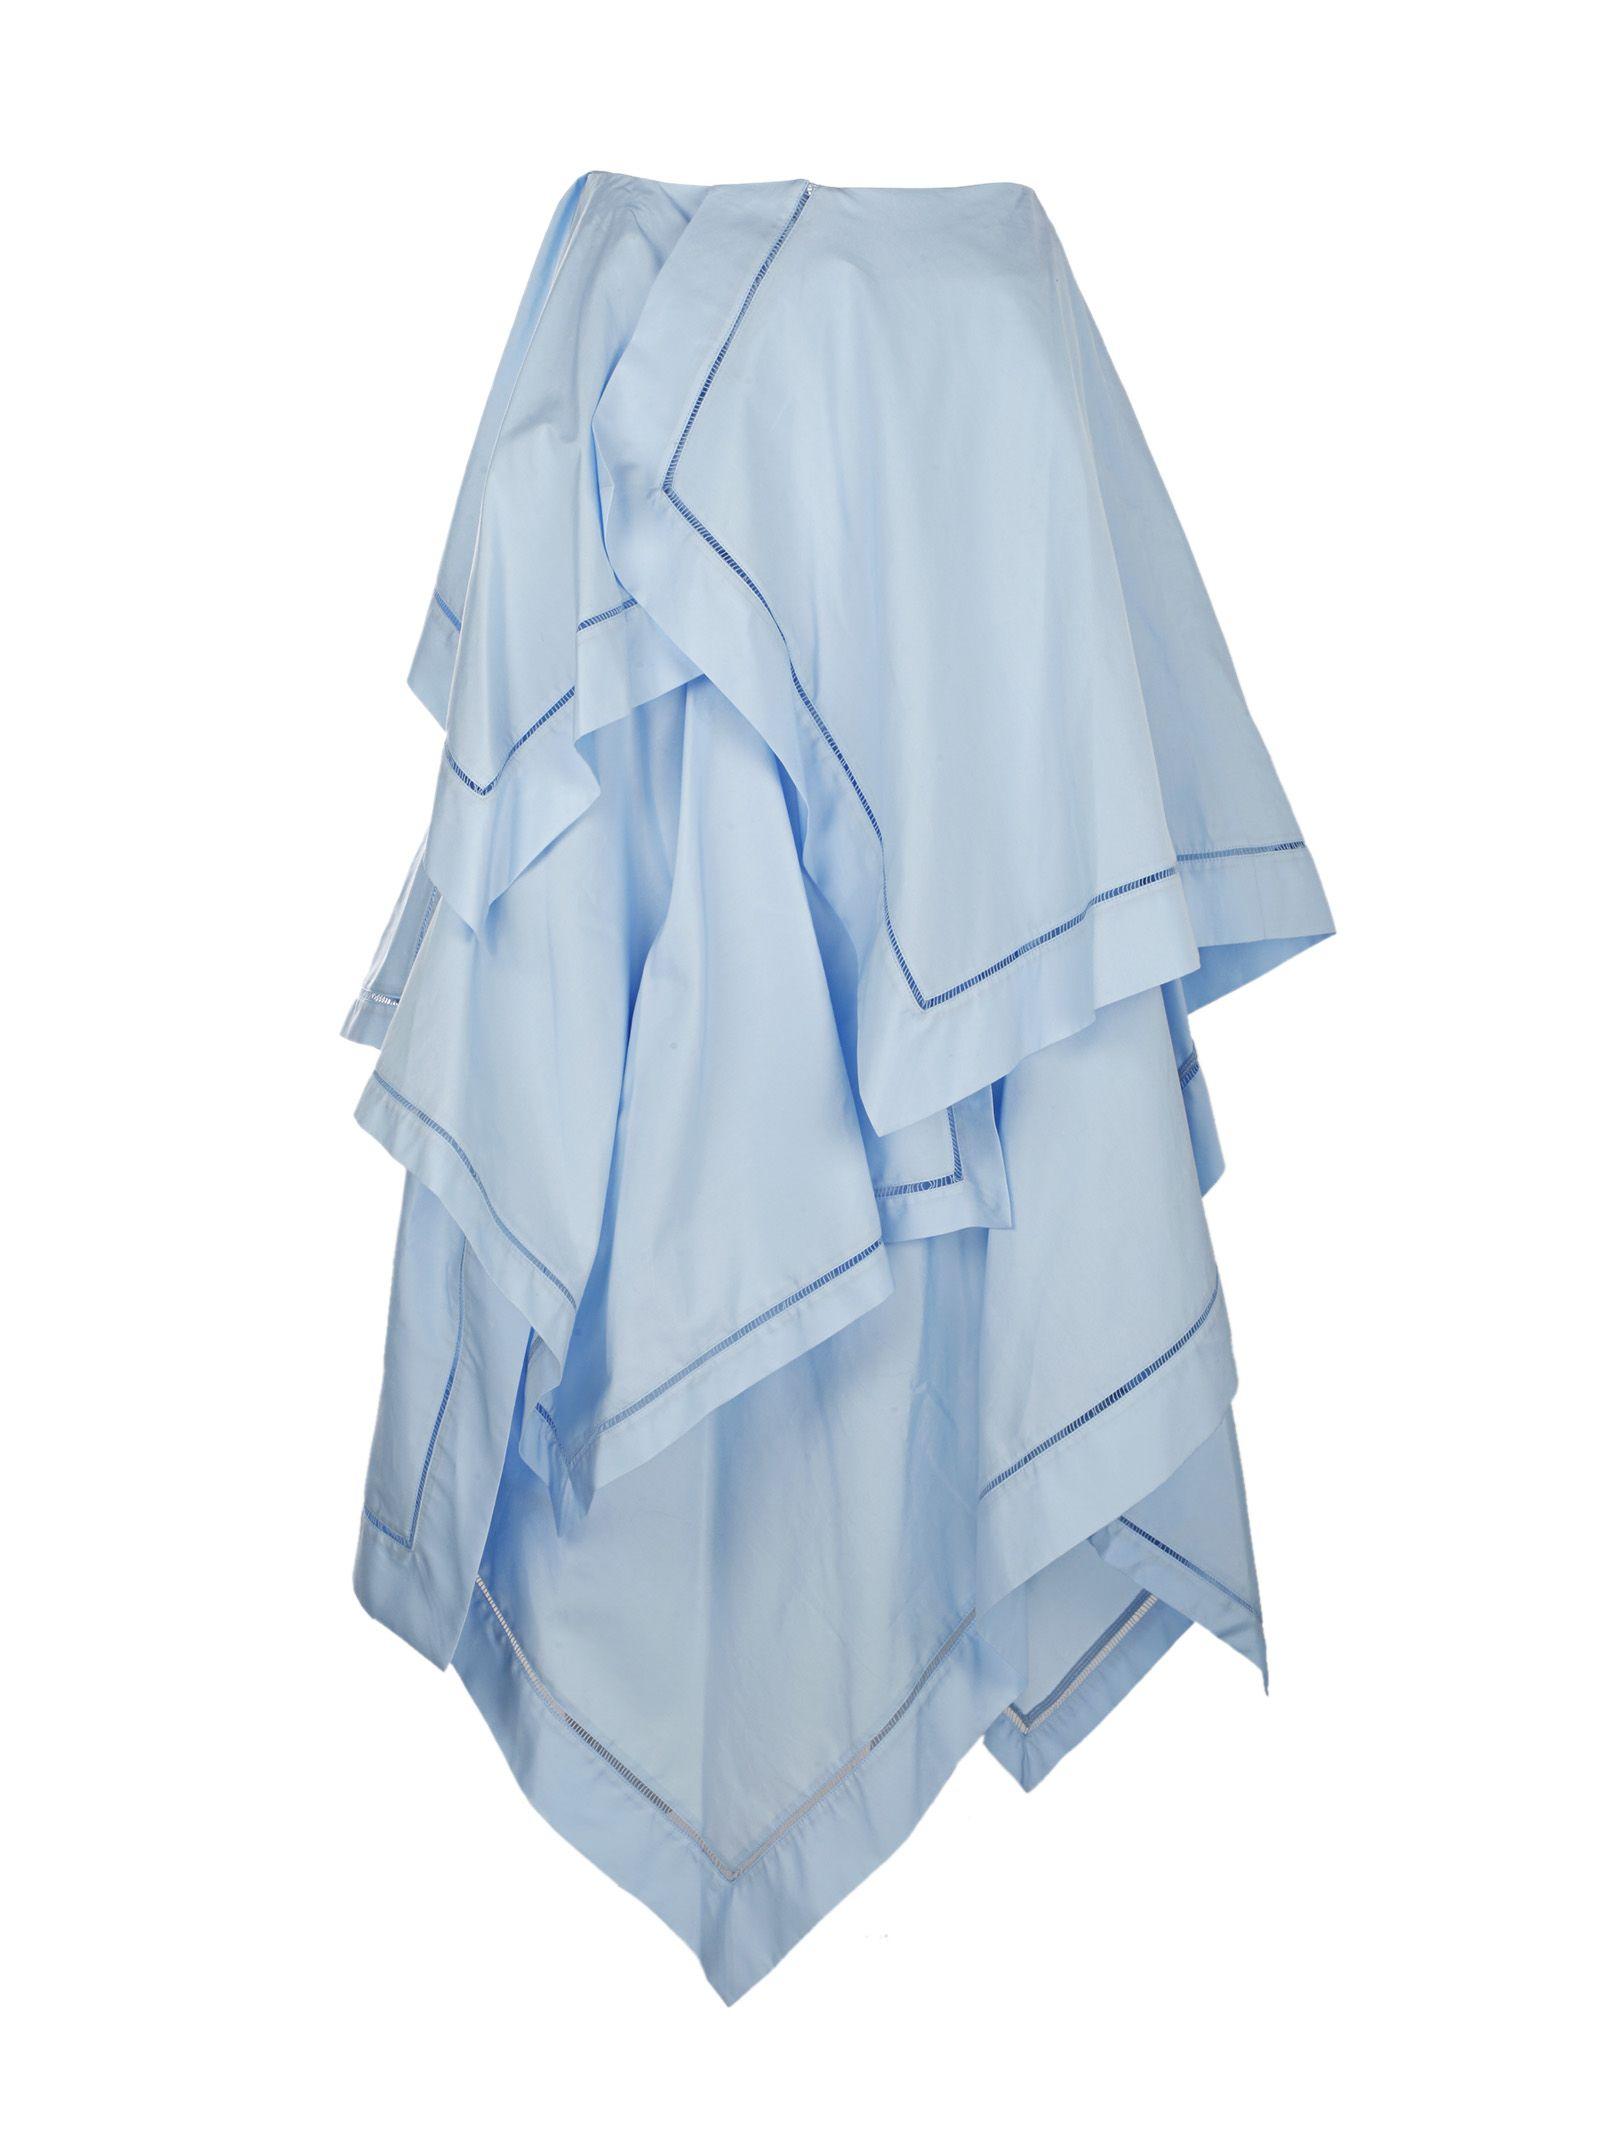 J.W. Anderson Maxi Handkerchief Skirt W Fagotting Trim